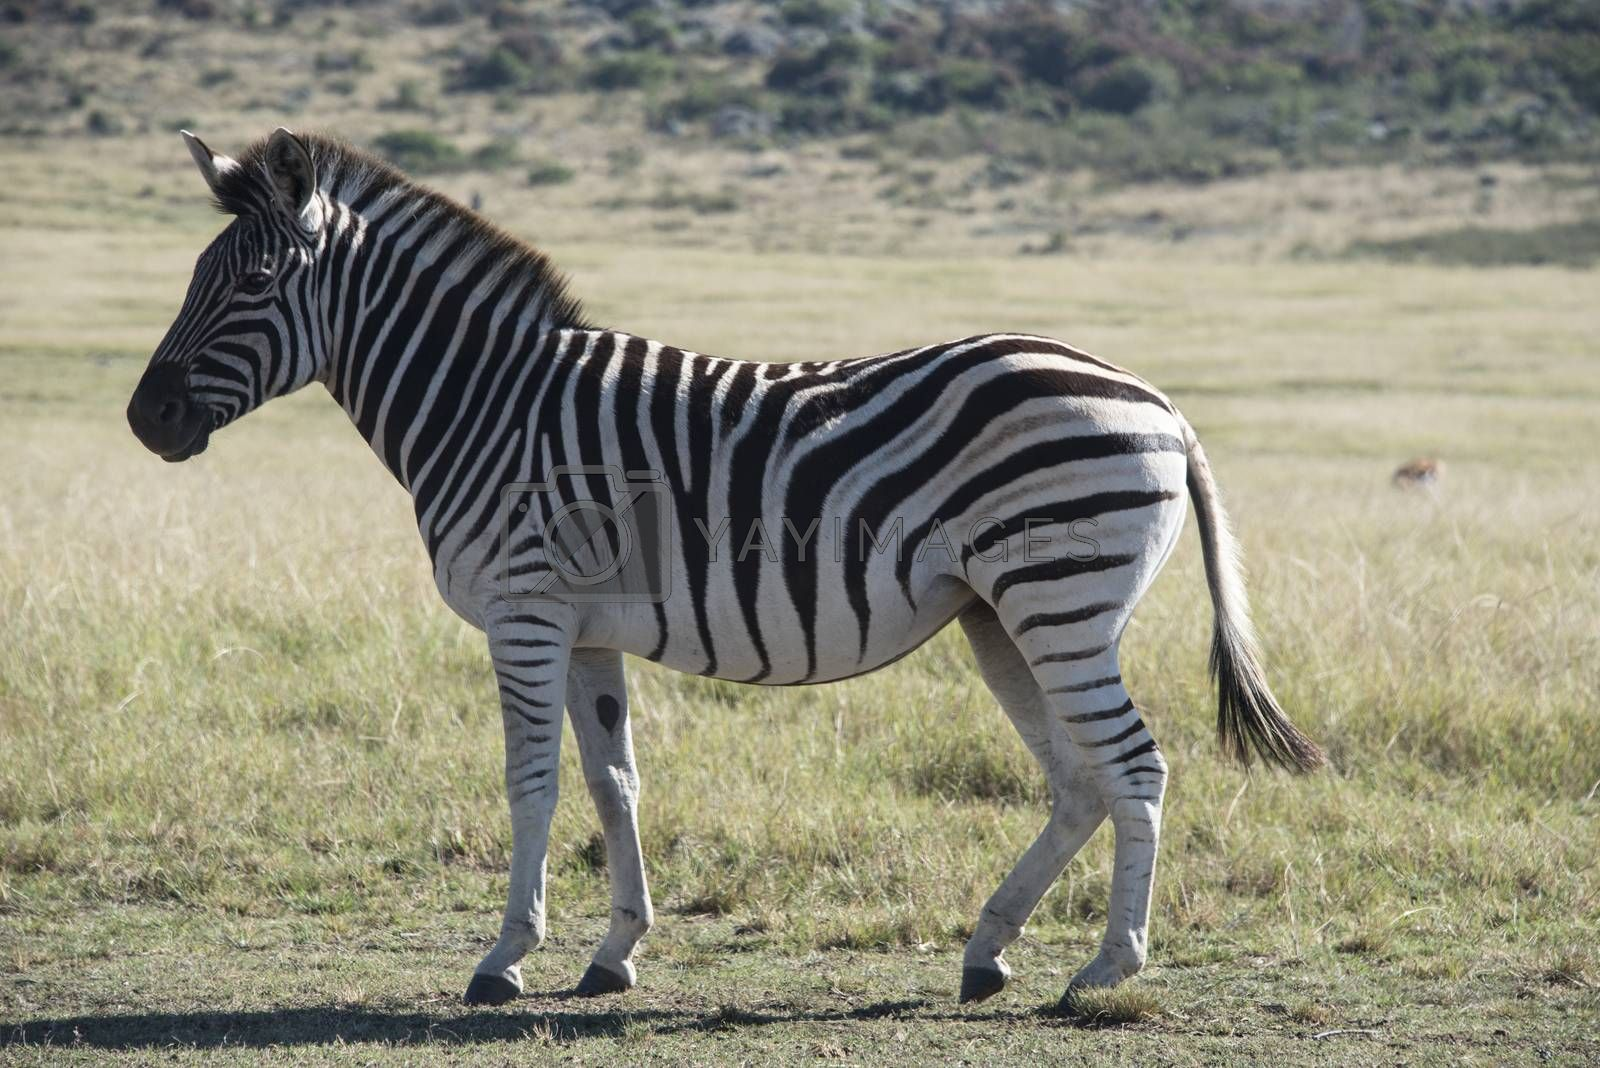 Close up of a zebra standing in a field, South Africa